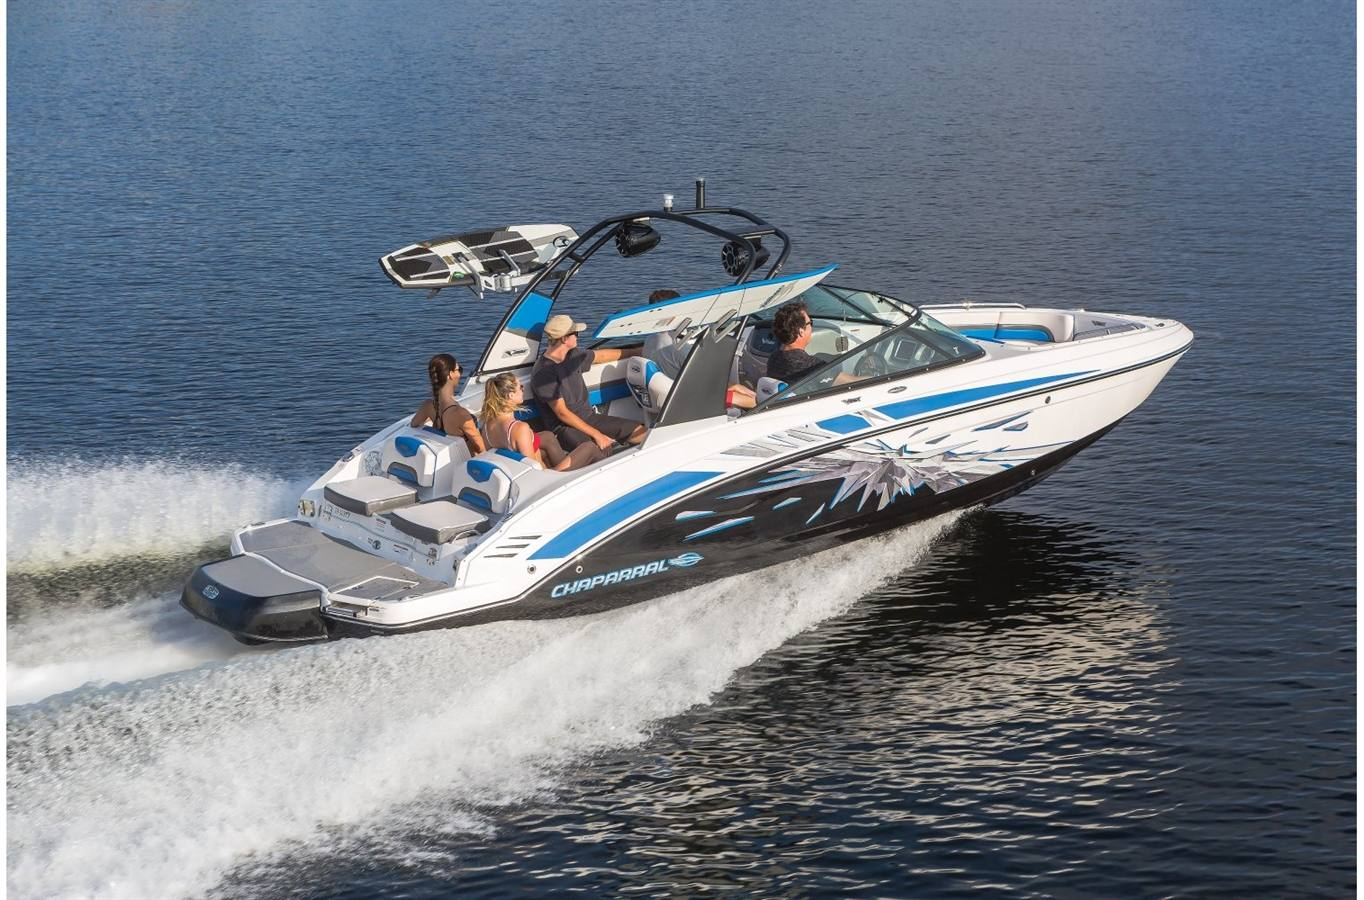 2019 Vortex Boats 2430 Vortex VRX for sale in North